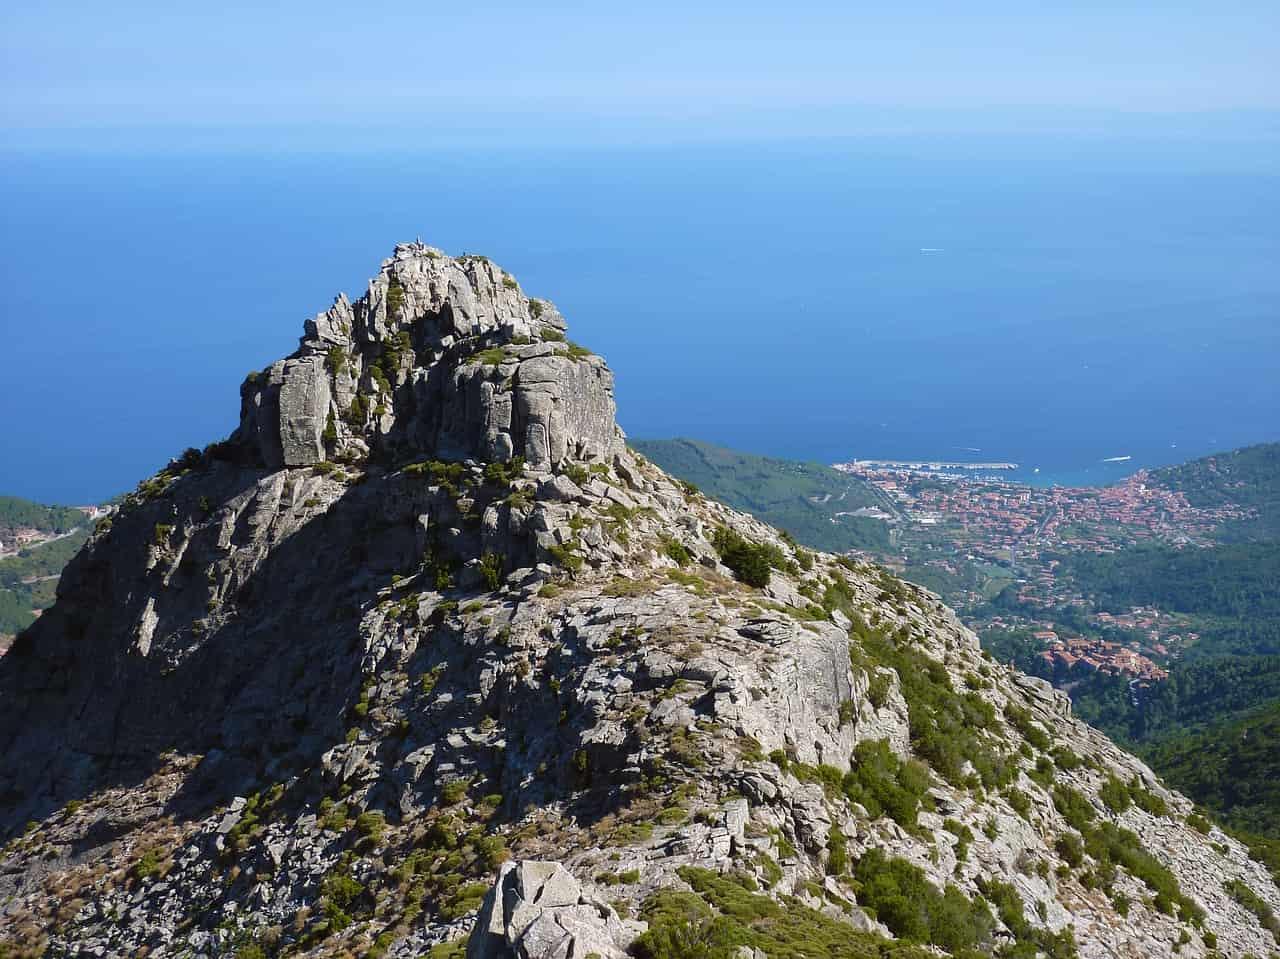 Monte Capanne Isola d'Elba